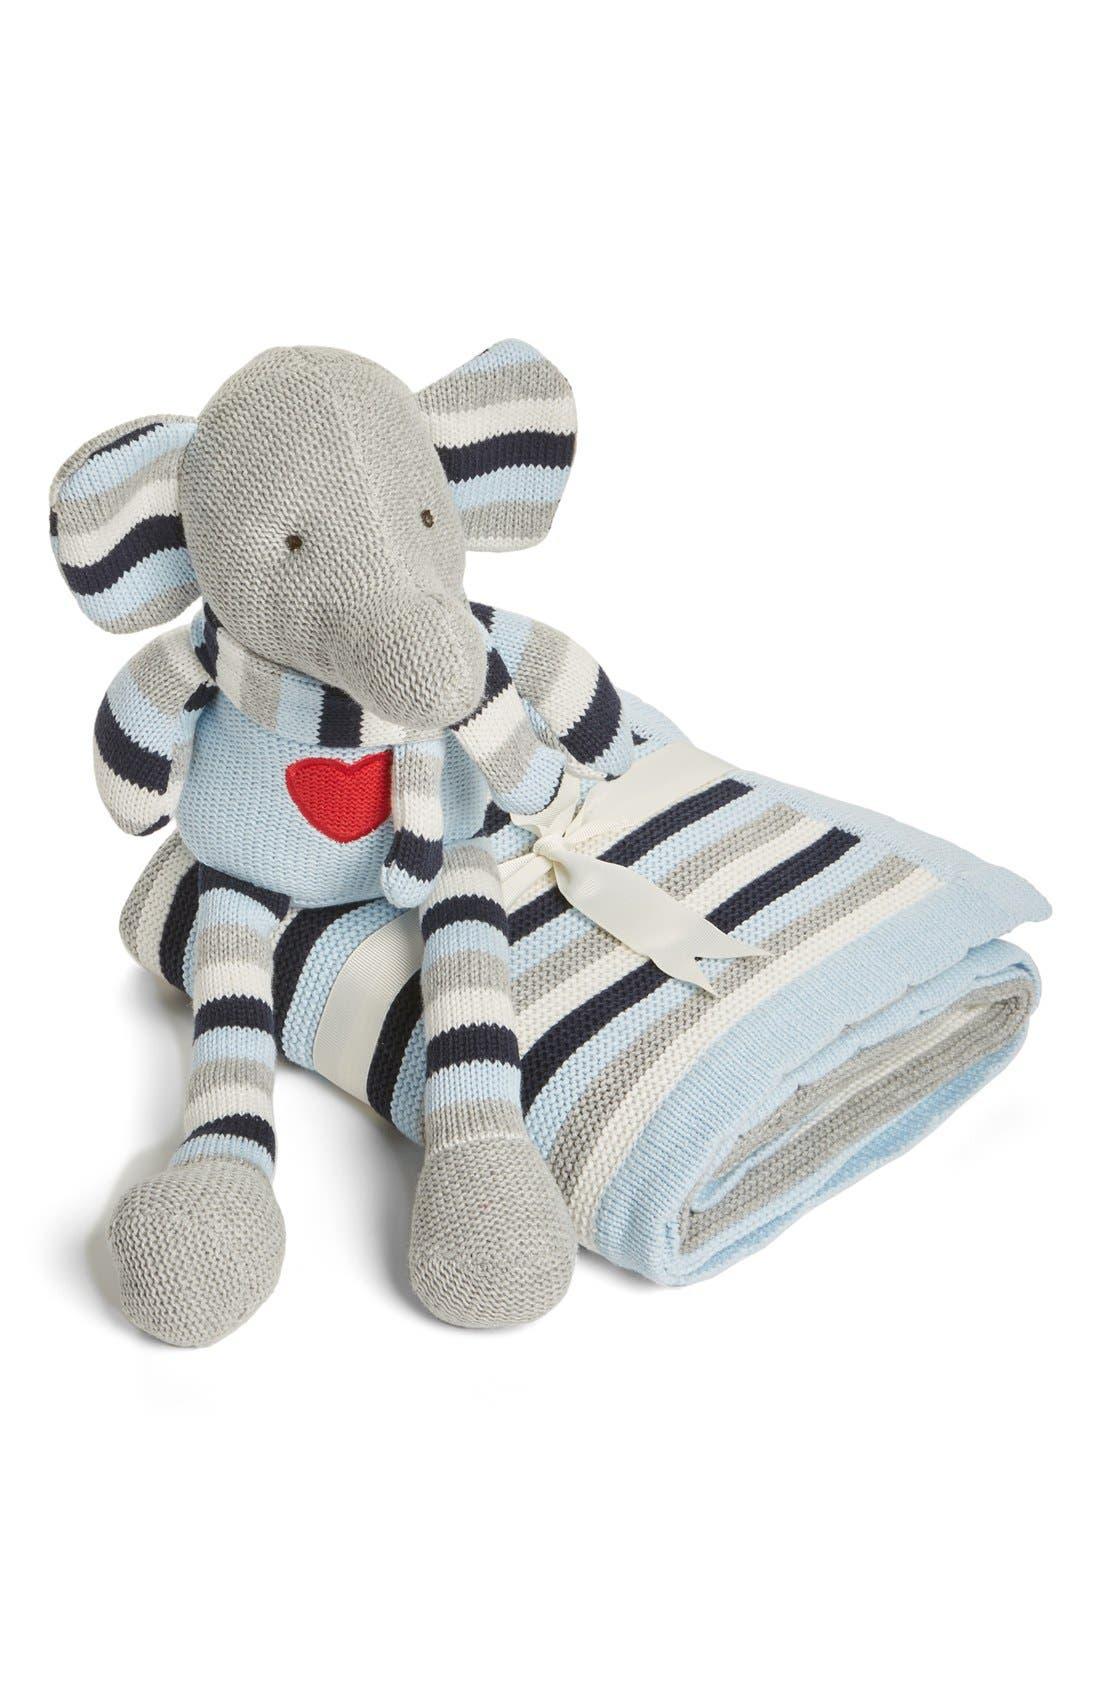 Alternate Image 1 Selected - Elegant Baby 'Knitty Bitty' Plush Knit Elephant Toy & Blanket